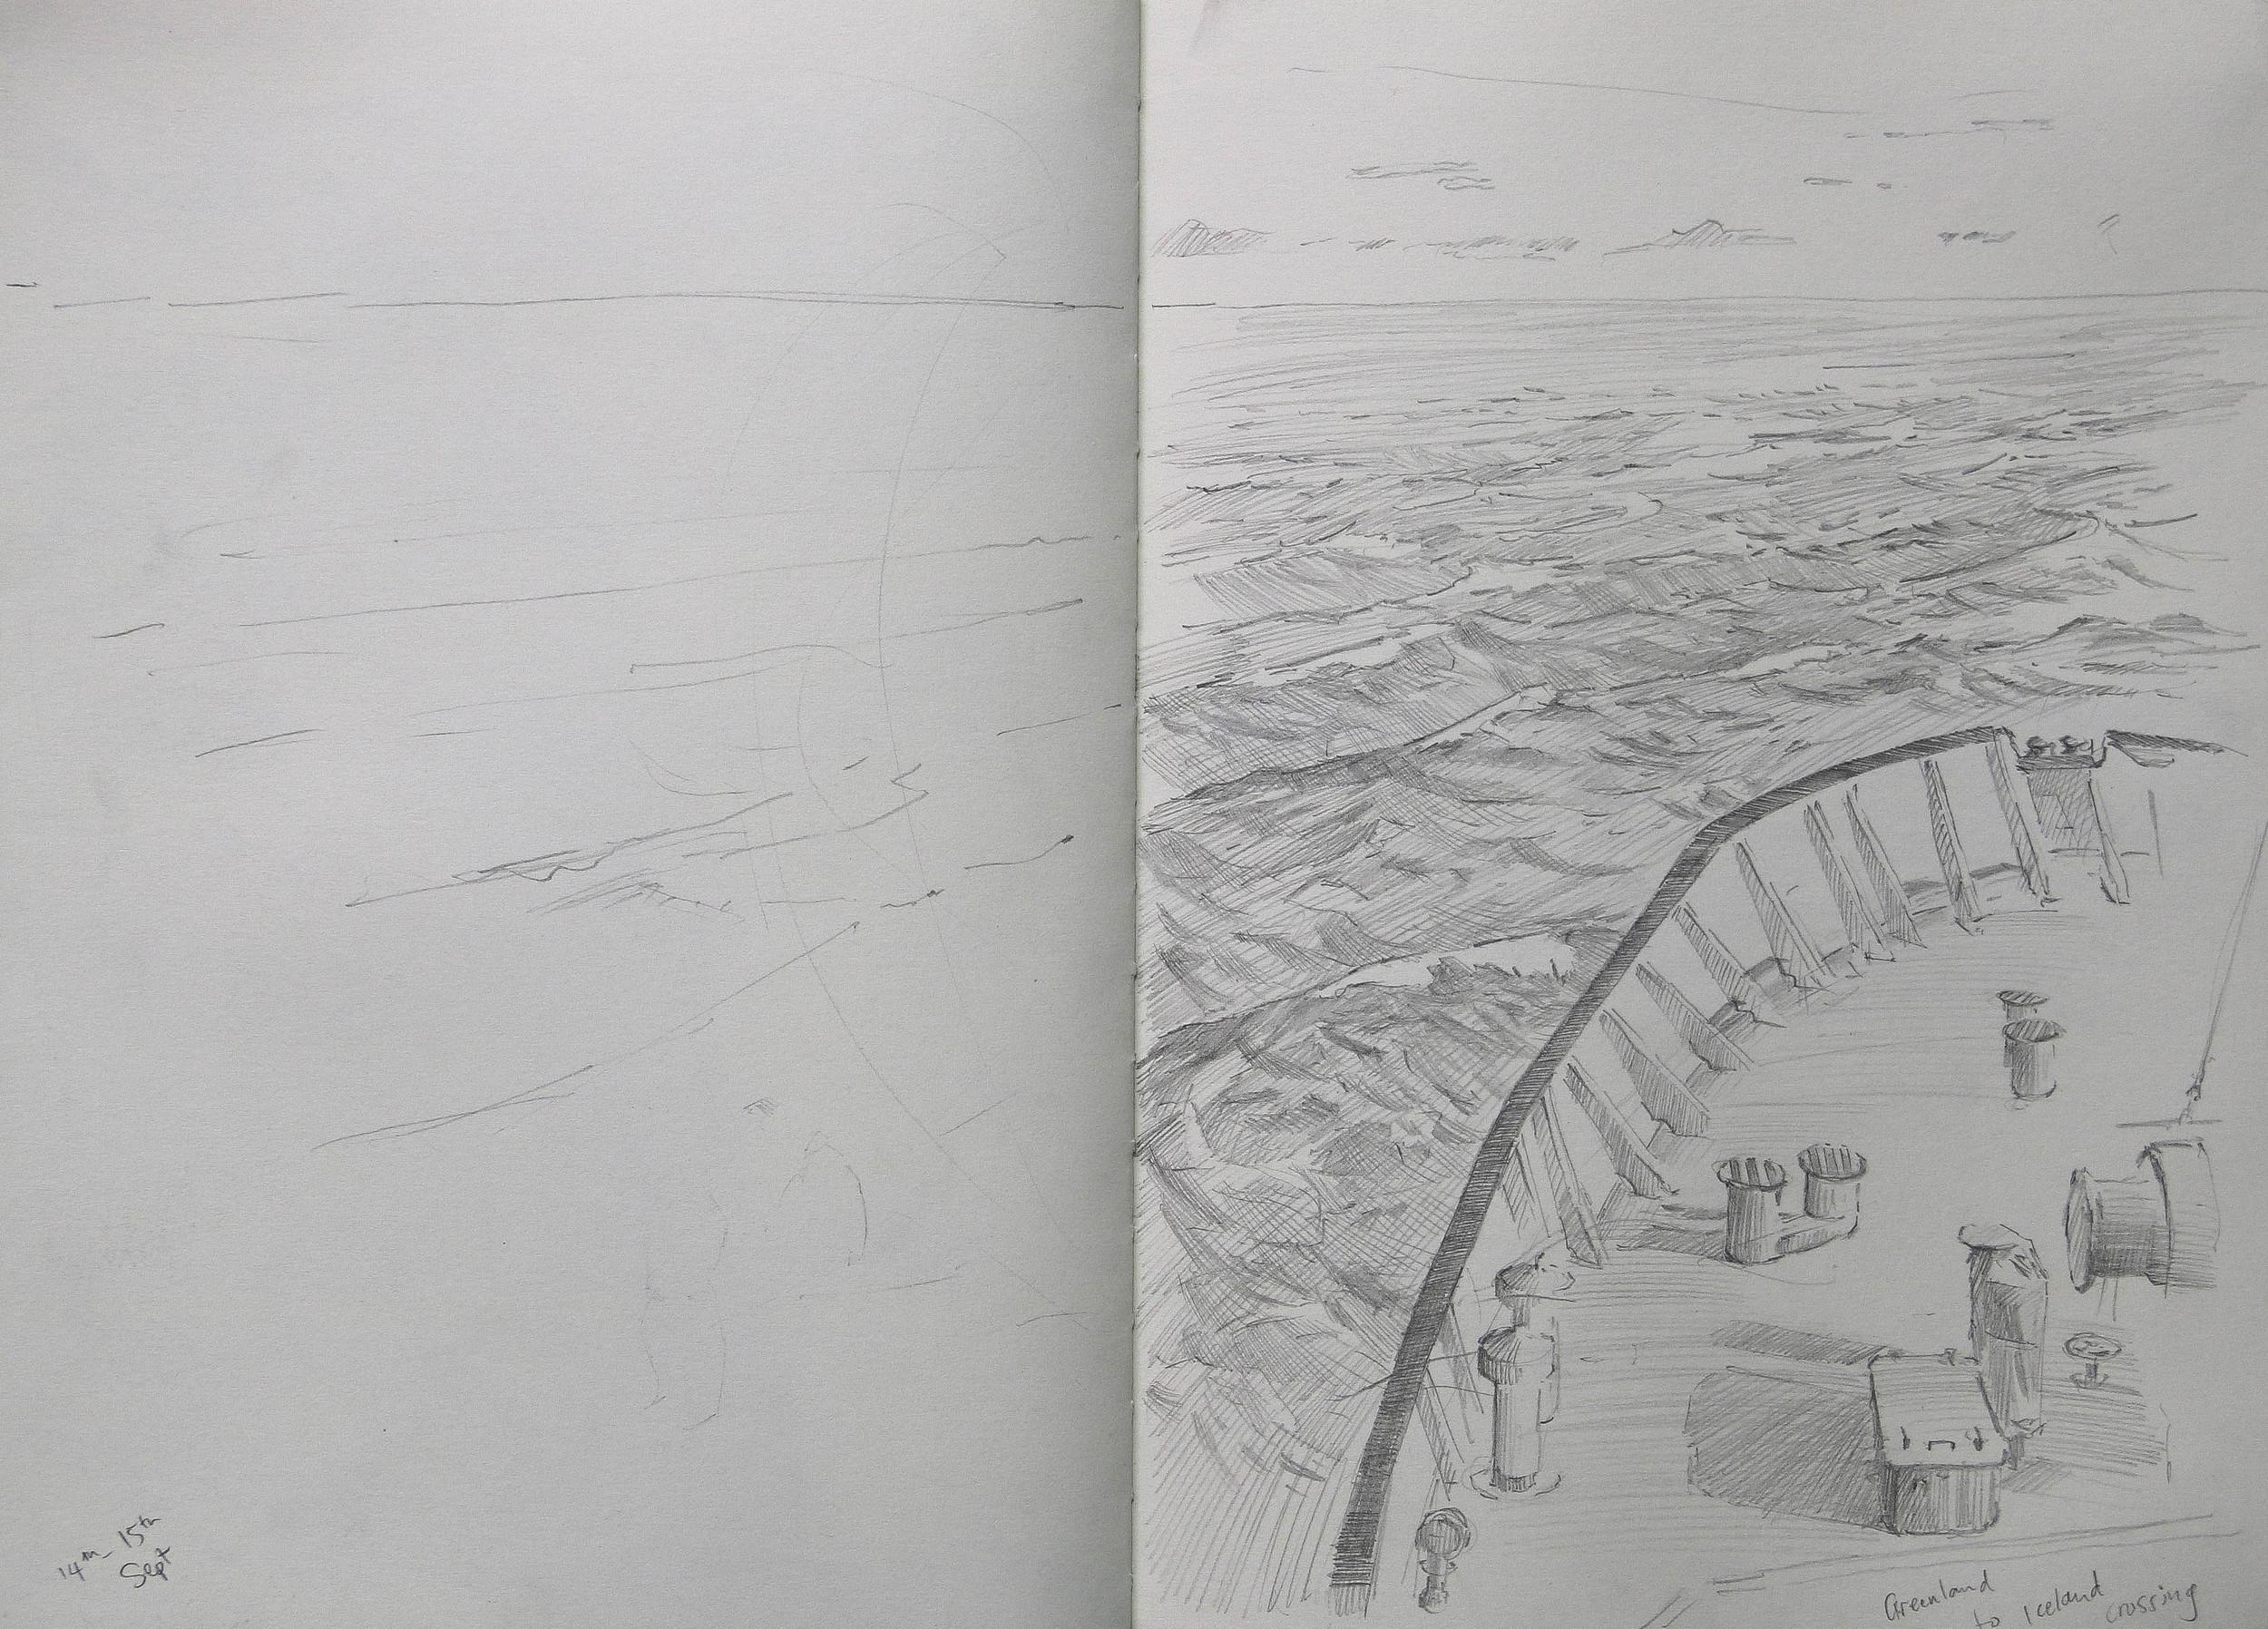 Pushing through the Denmark strait.